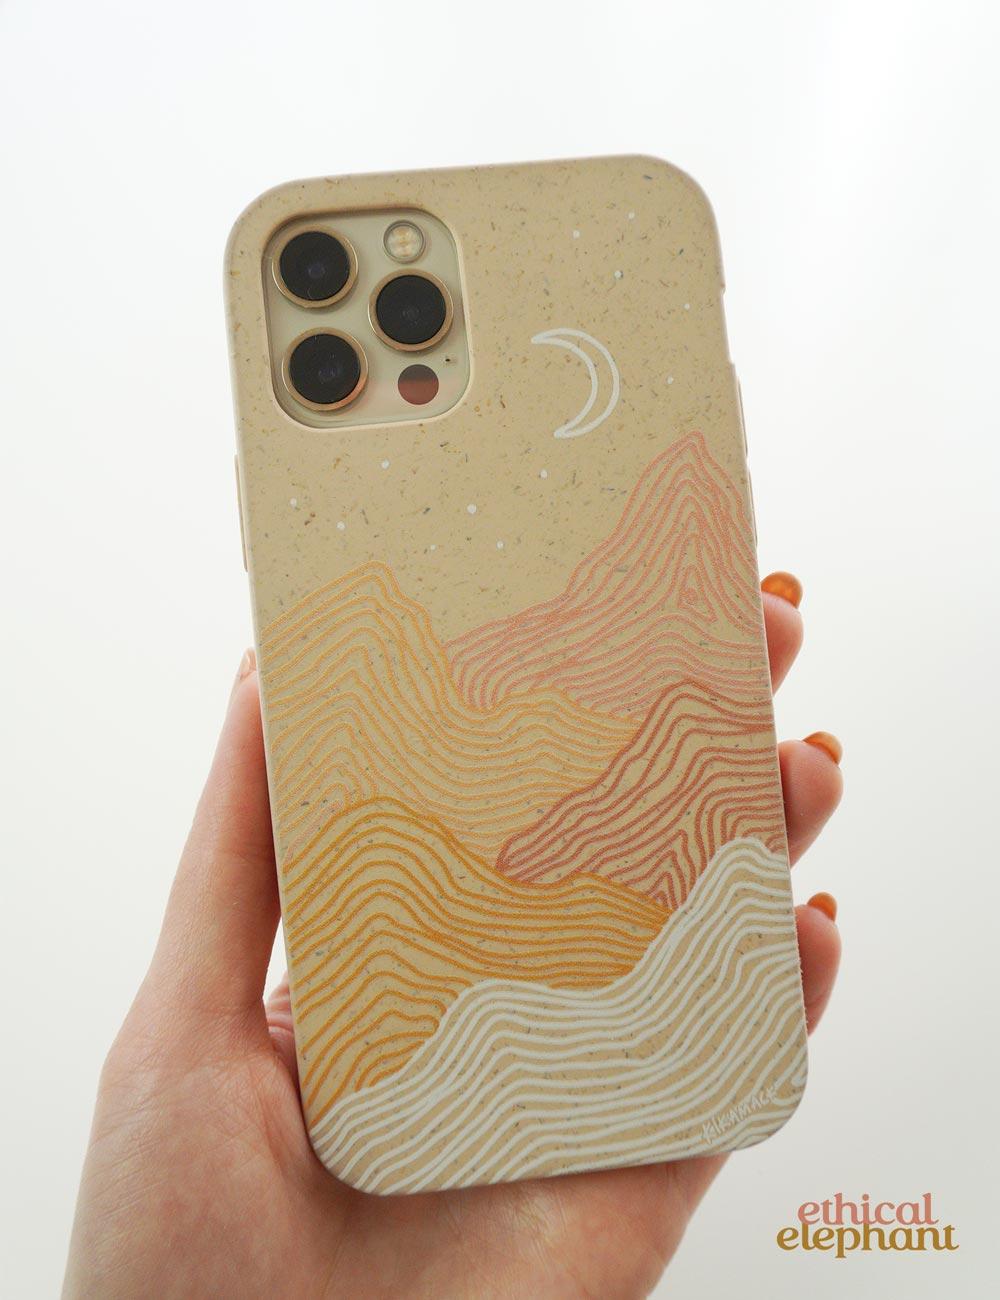 Pela Compostable Phone Case Review